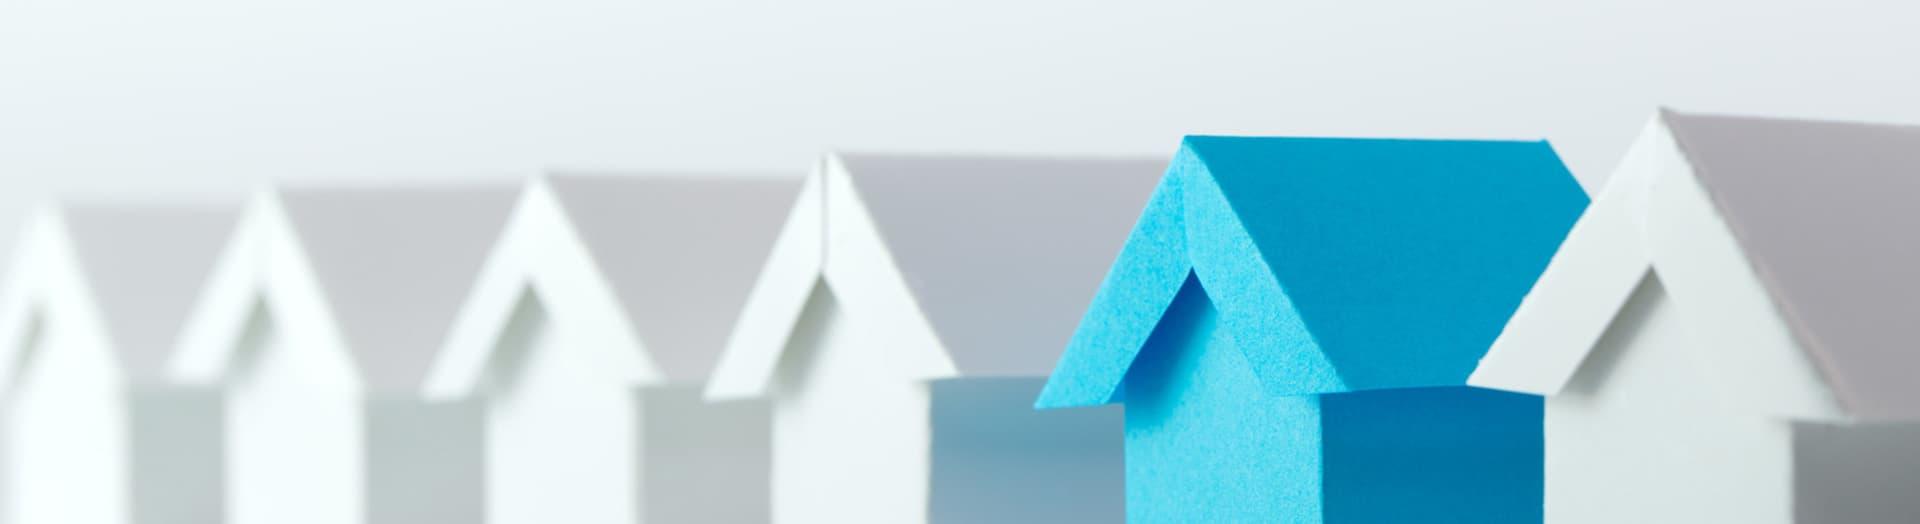 Do Debt Management Plans Hurt your Credit ? - Debt.com